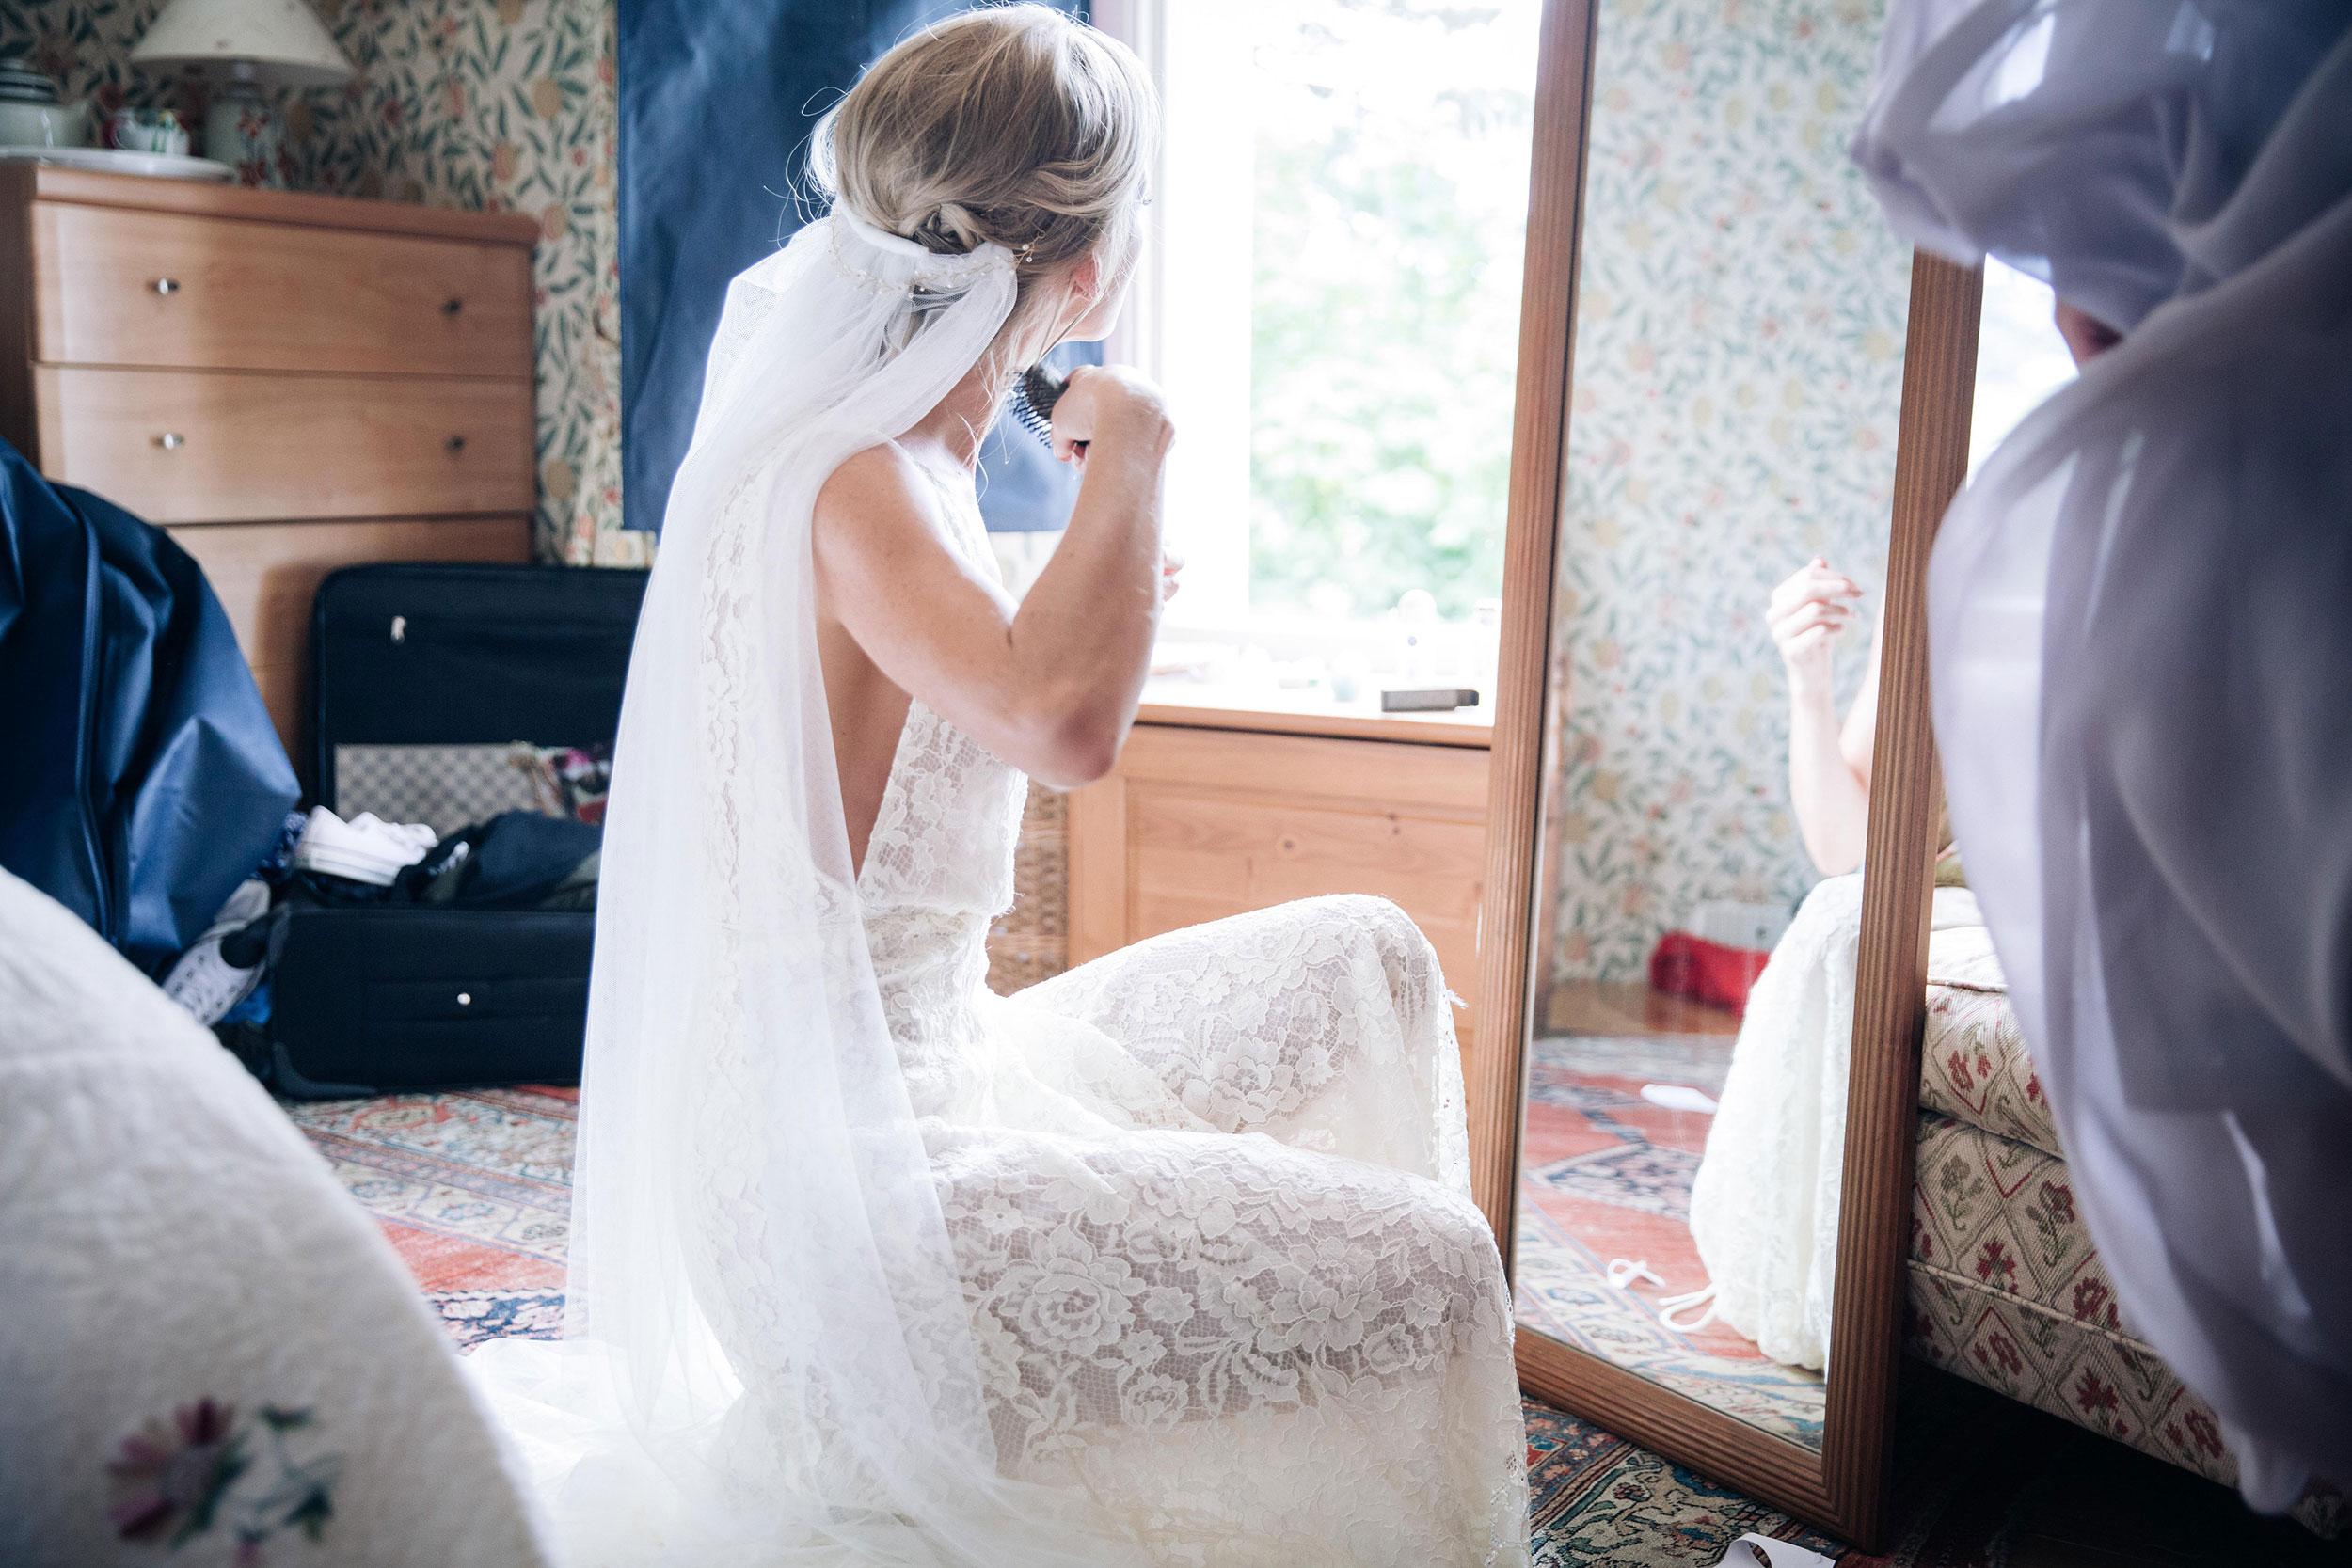 16.07.16-Tanya-&-Jethro-Wedding-Selection-21.jpg